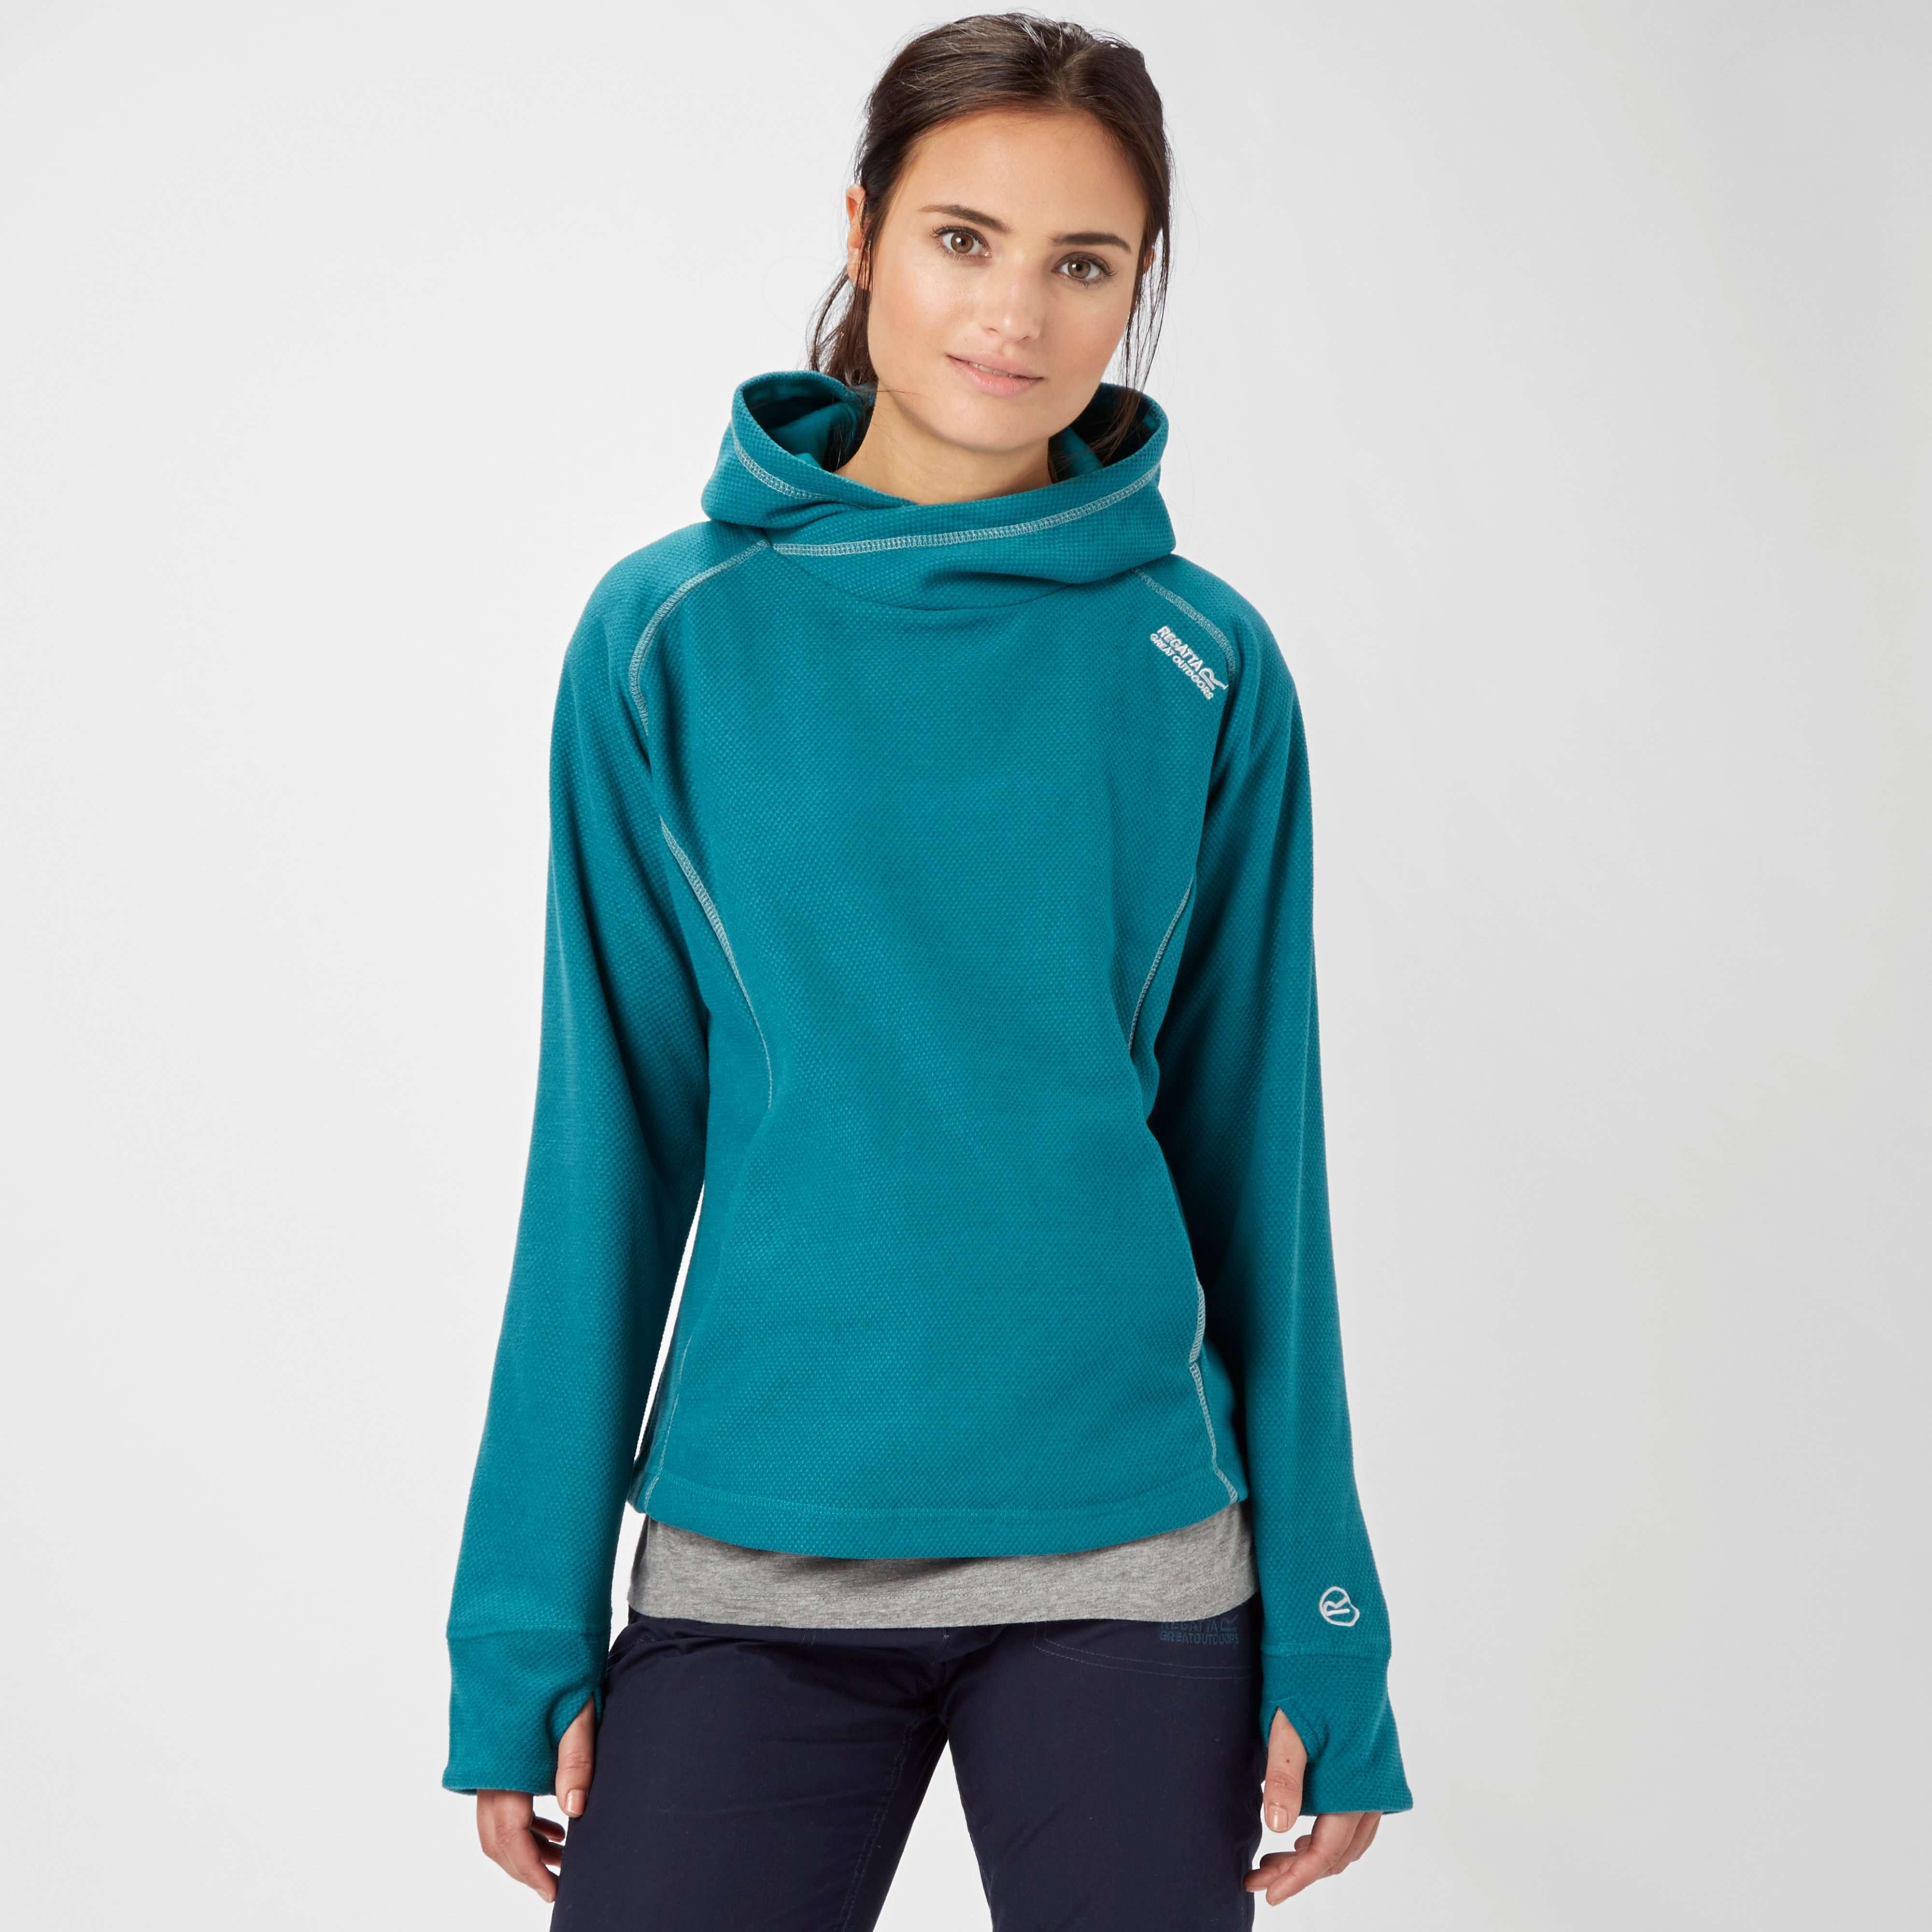 REGATTA Women's Antero Fleece Hoodie